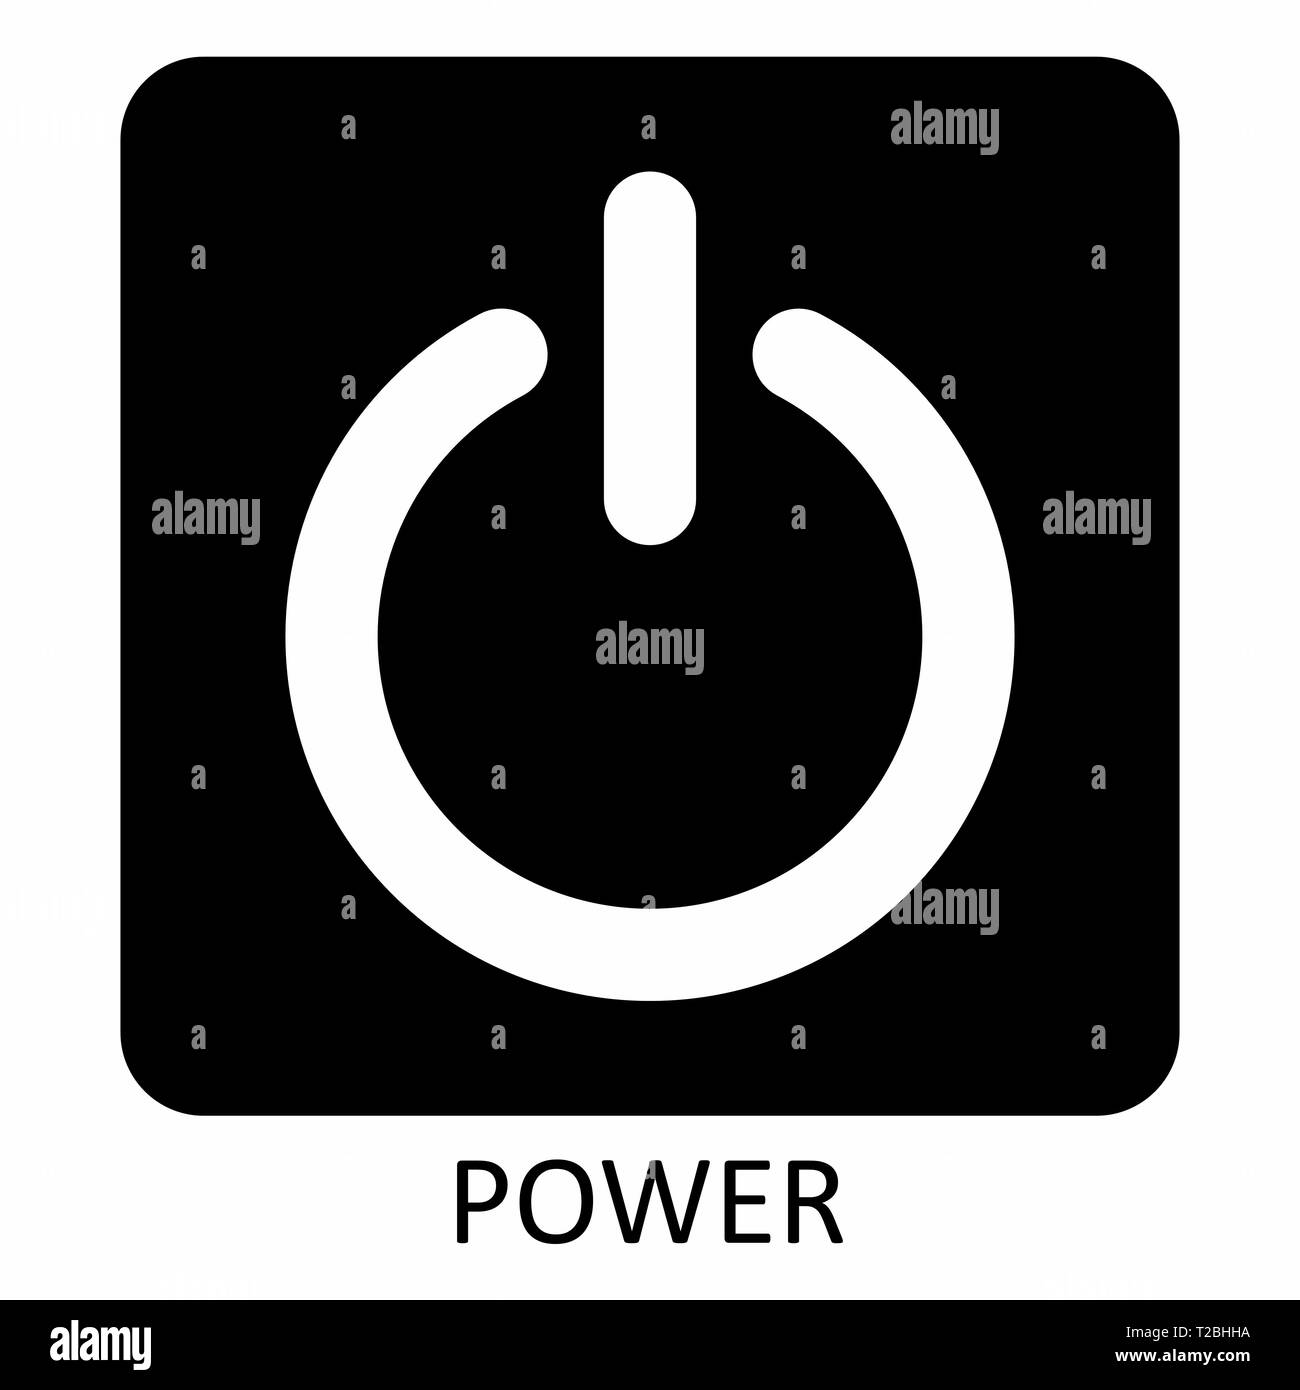 Power symbol illustration - Stock Vector